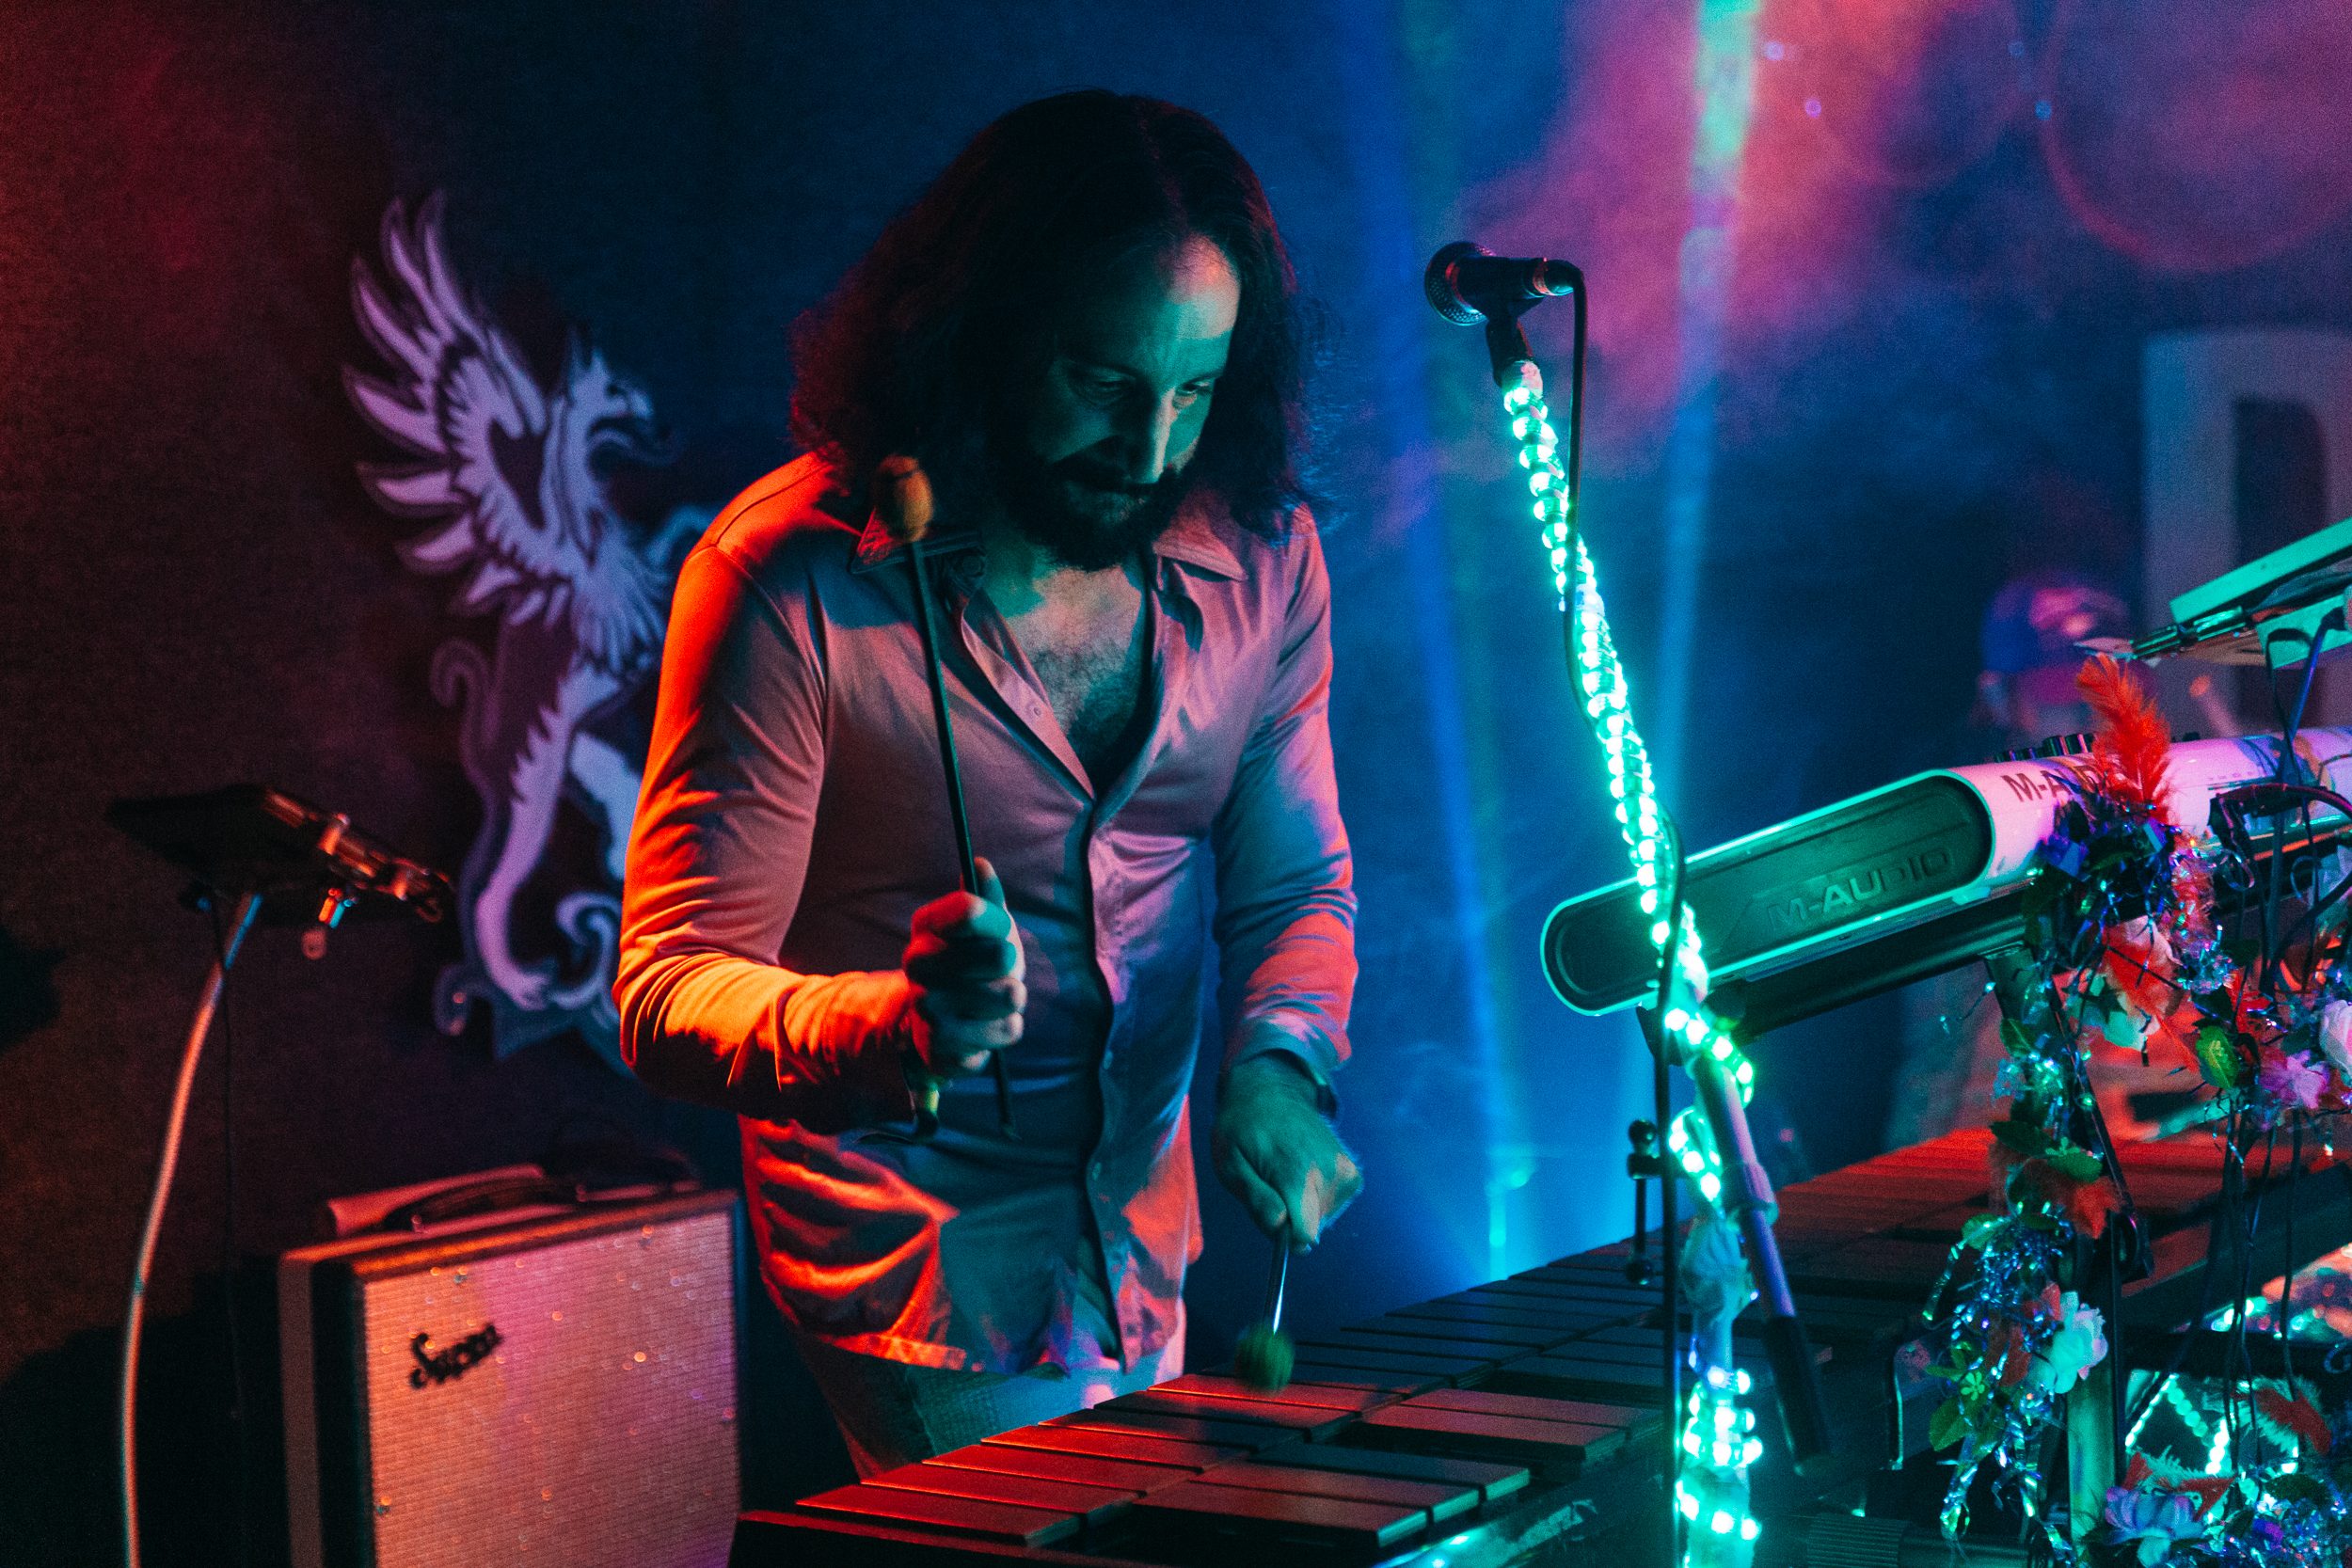 Calliope Musicals at DC9 (Photo by Mauricio Castro)